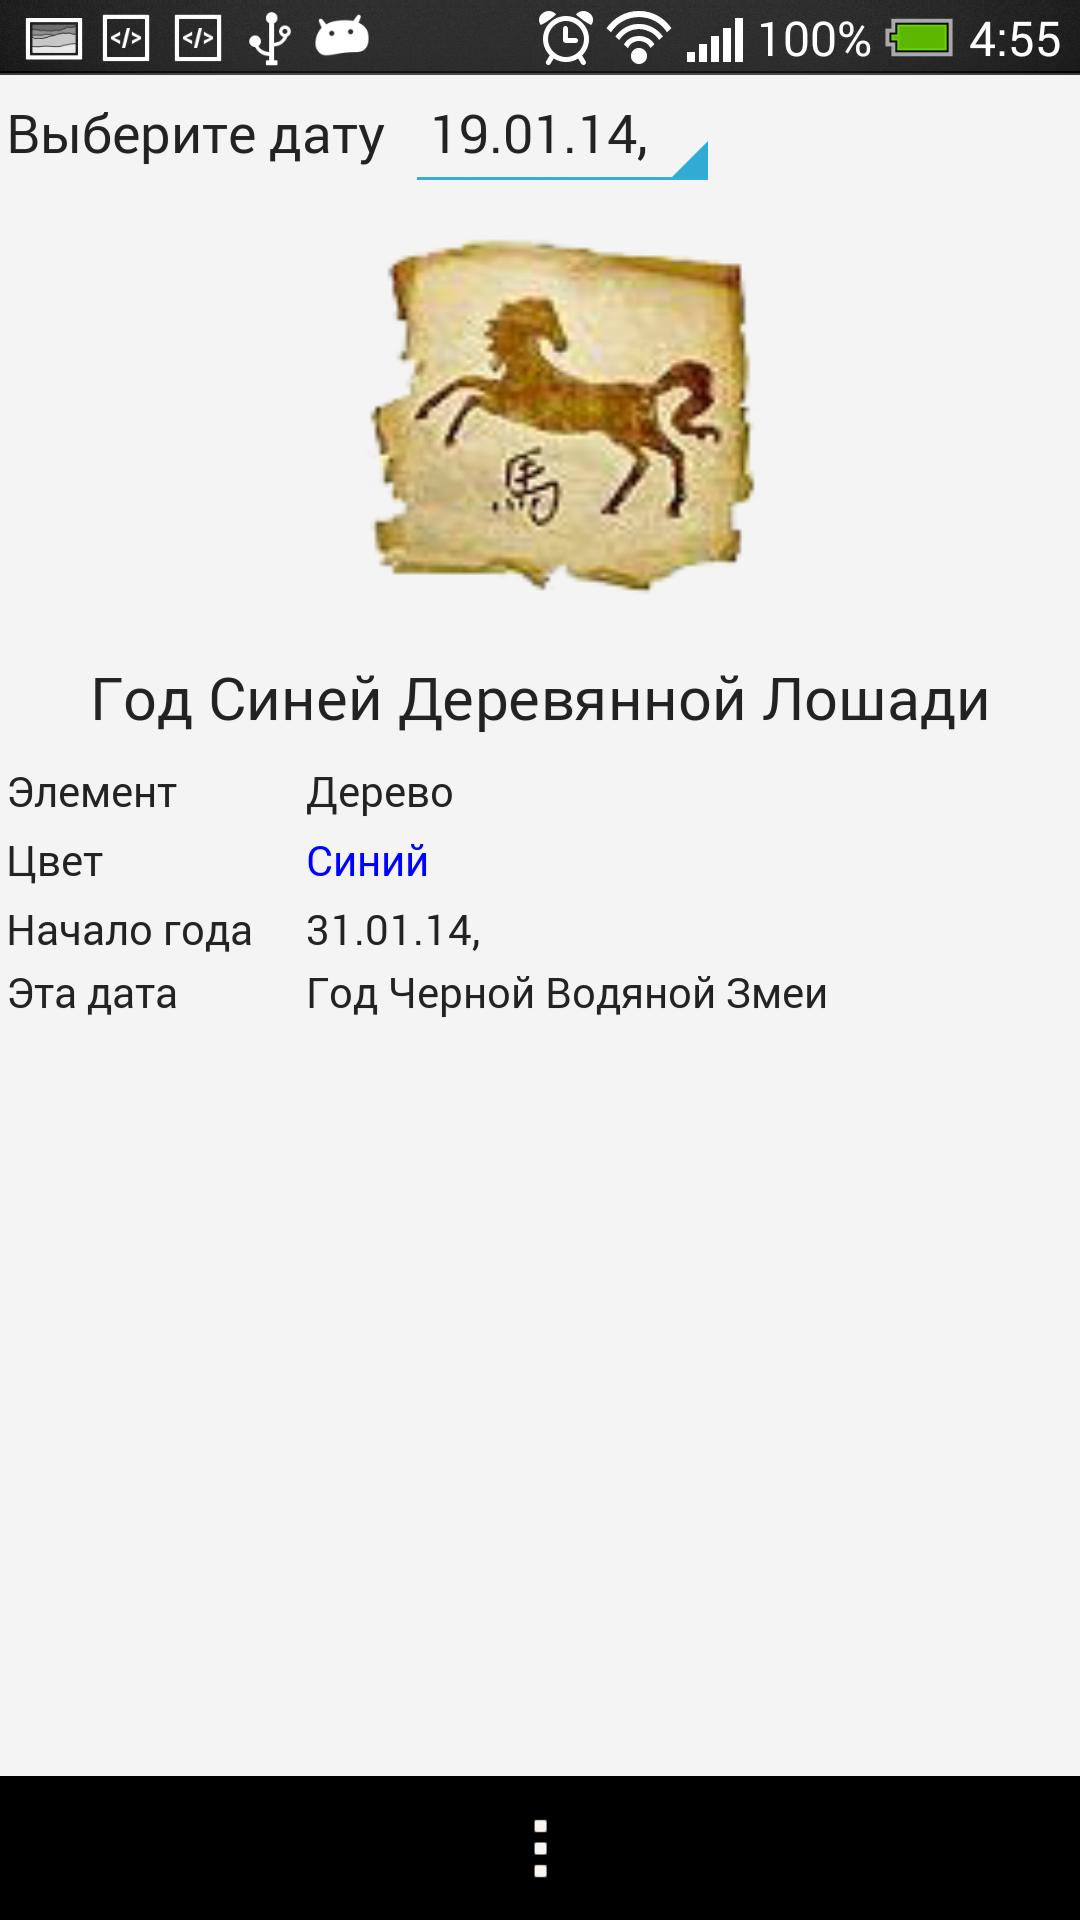 Delphi xe android на весь экран - 56f3